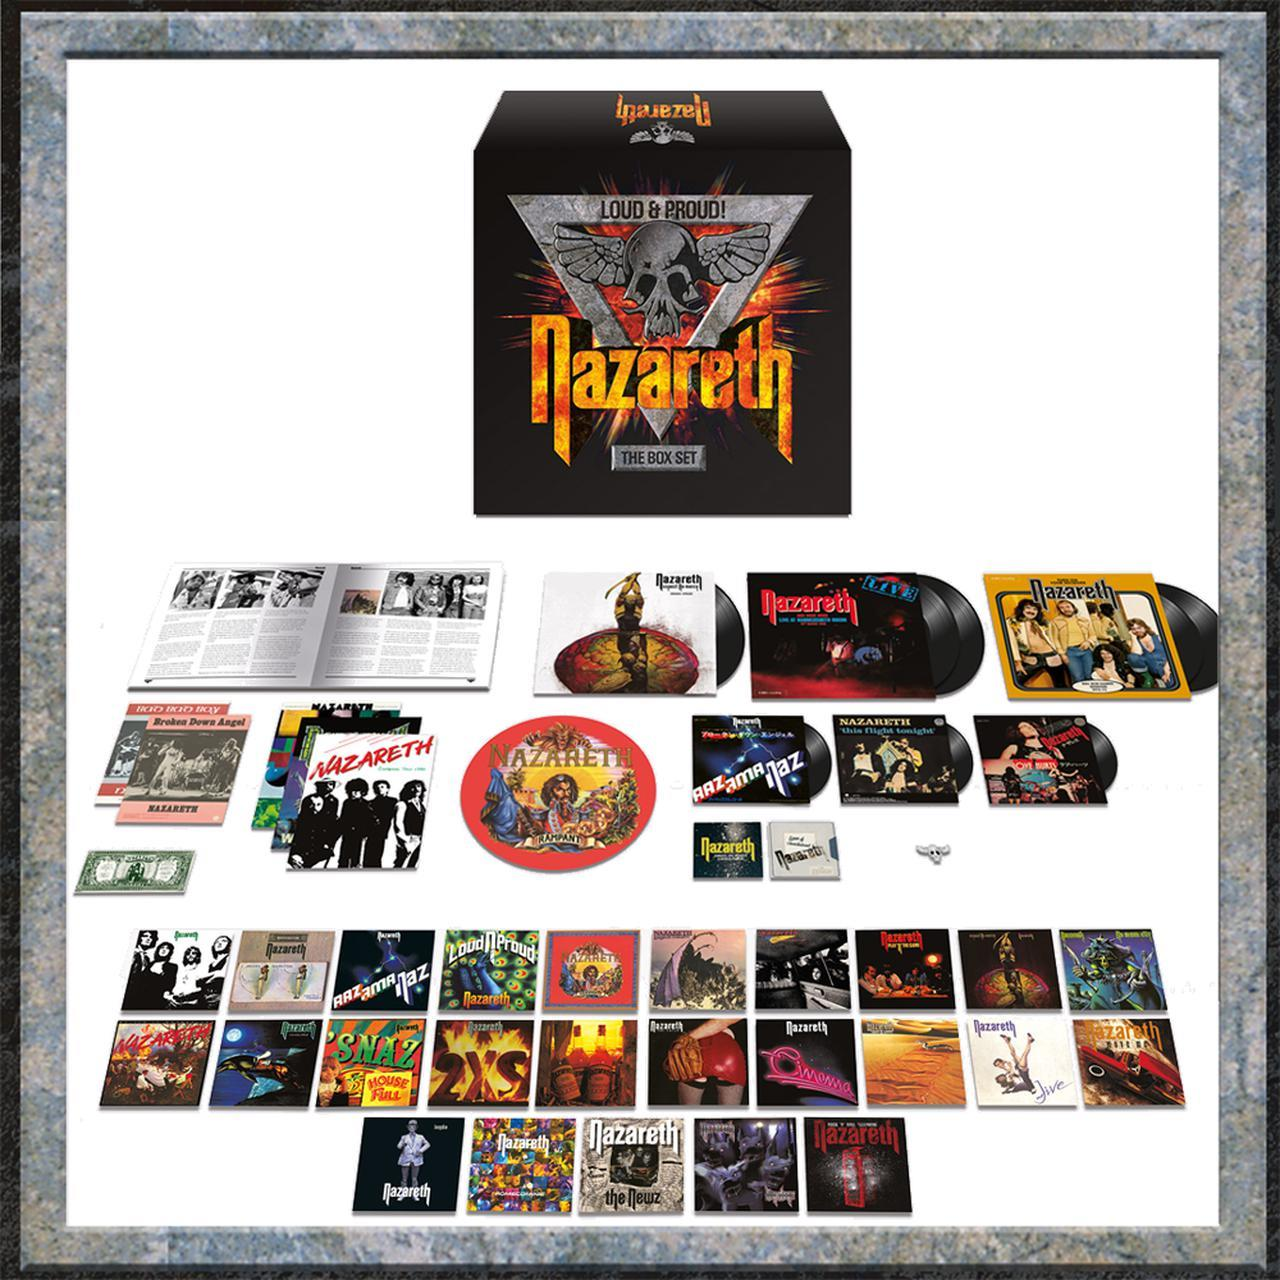 Nazareth - Loud & Proud! The Box Set [4LP + 32CD]